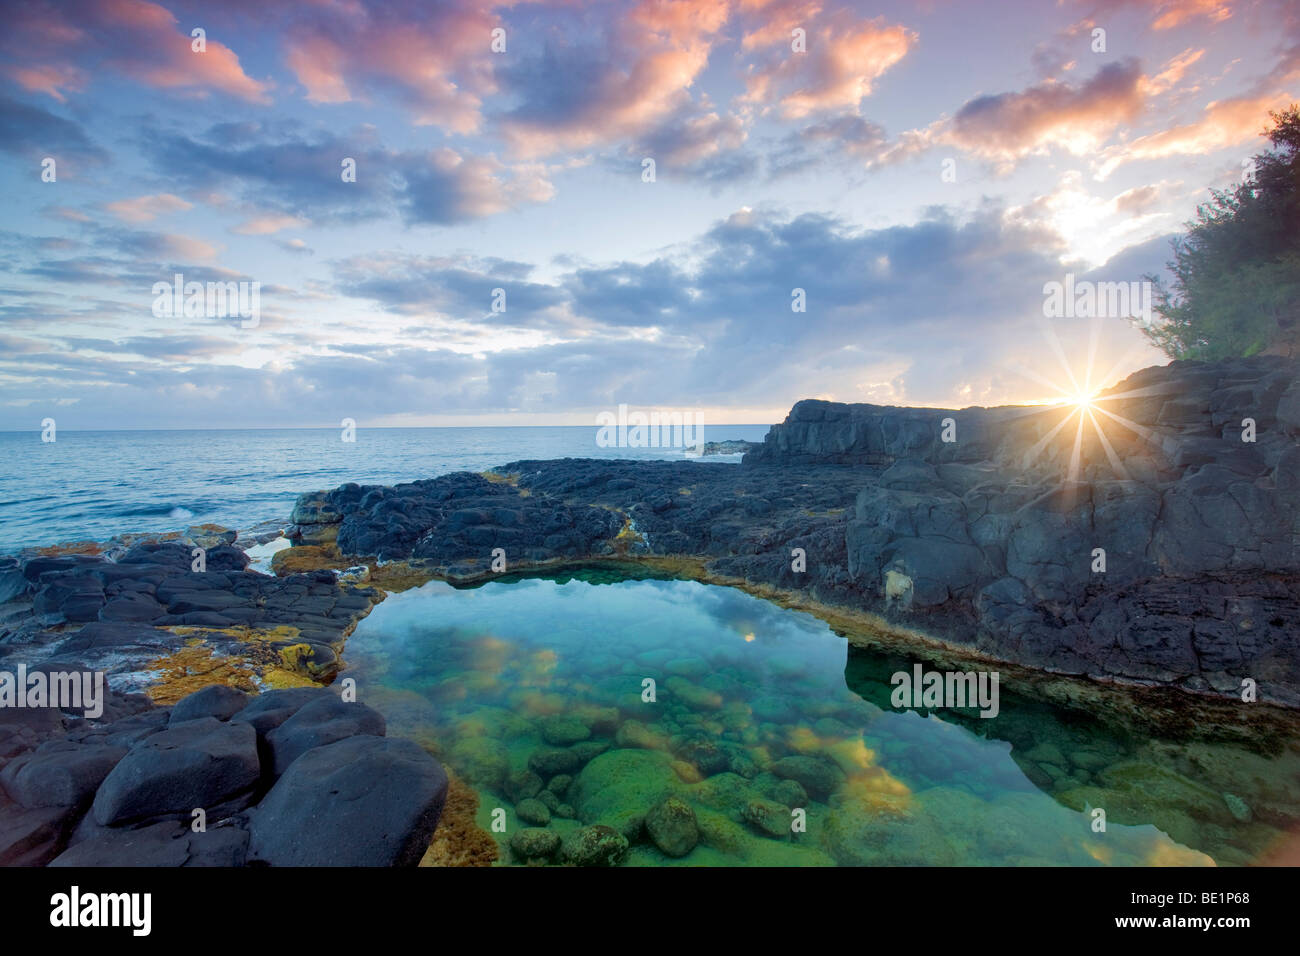 Queen's Bath with sunrise. Kauai, Hawaii. - Stock Image